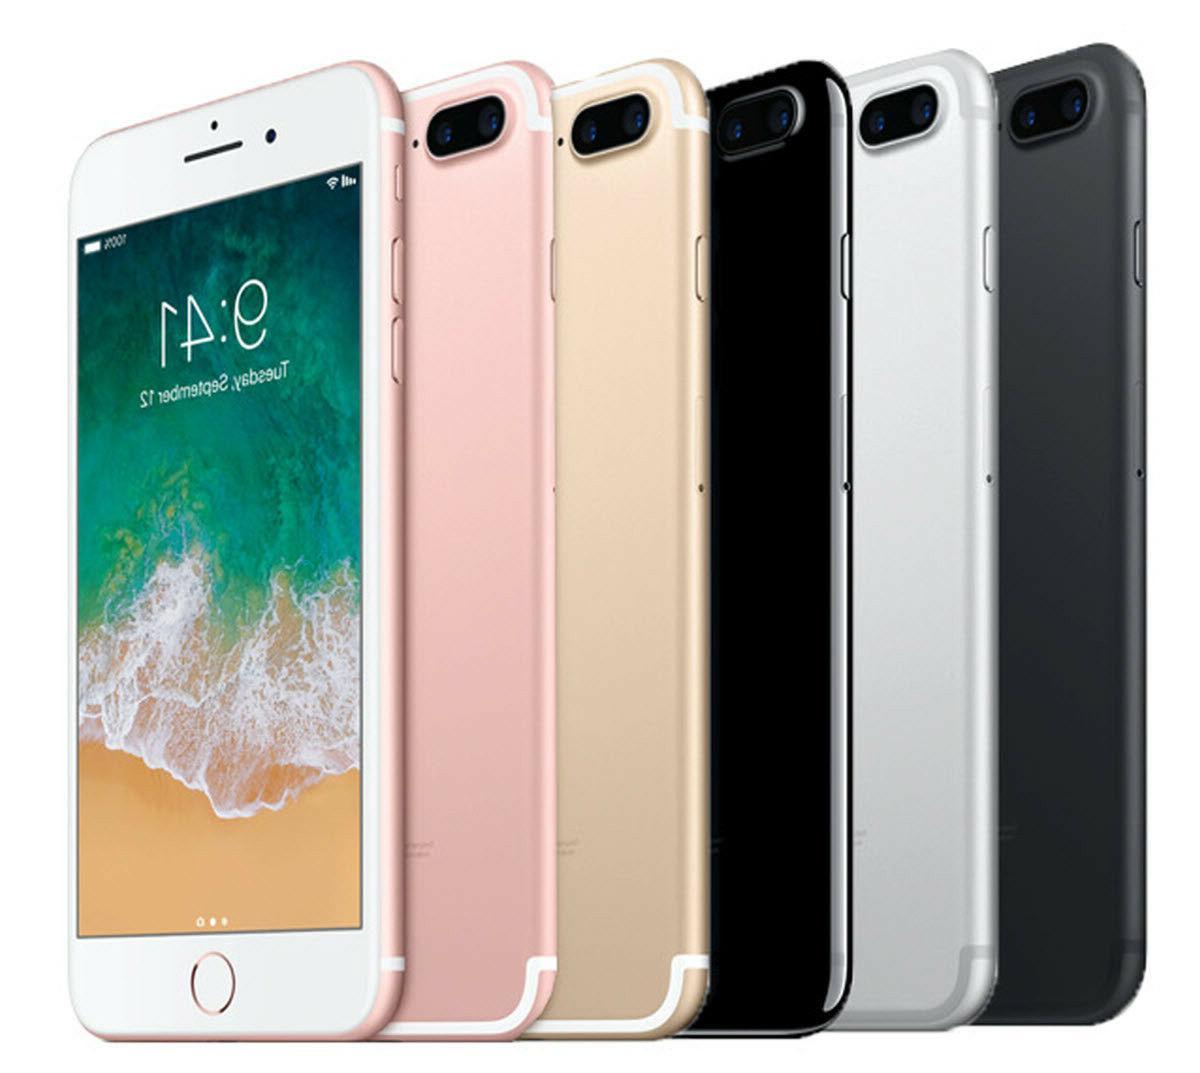 iphone 7 factory unlocked verizon t mobile